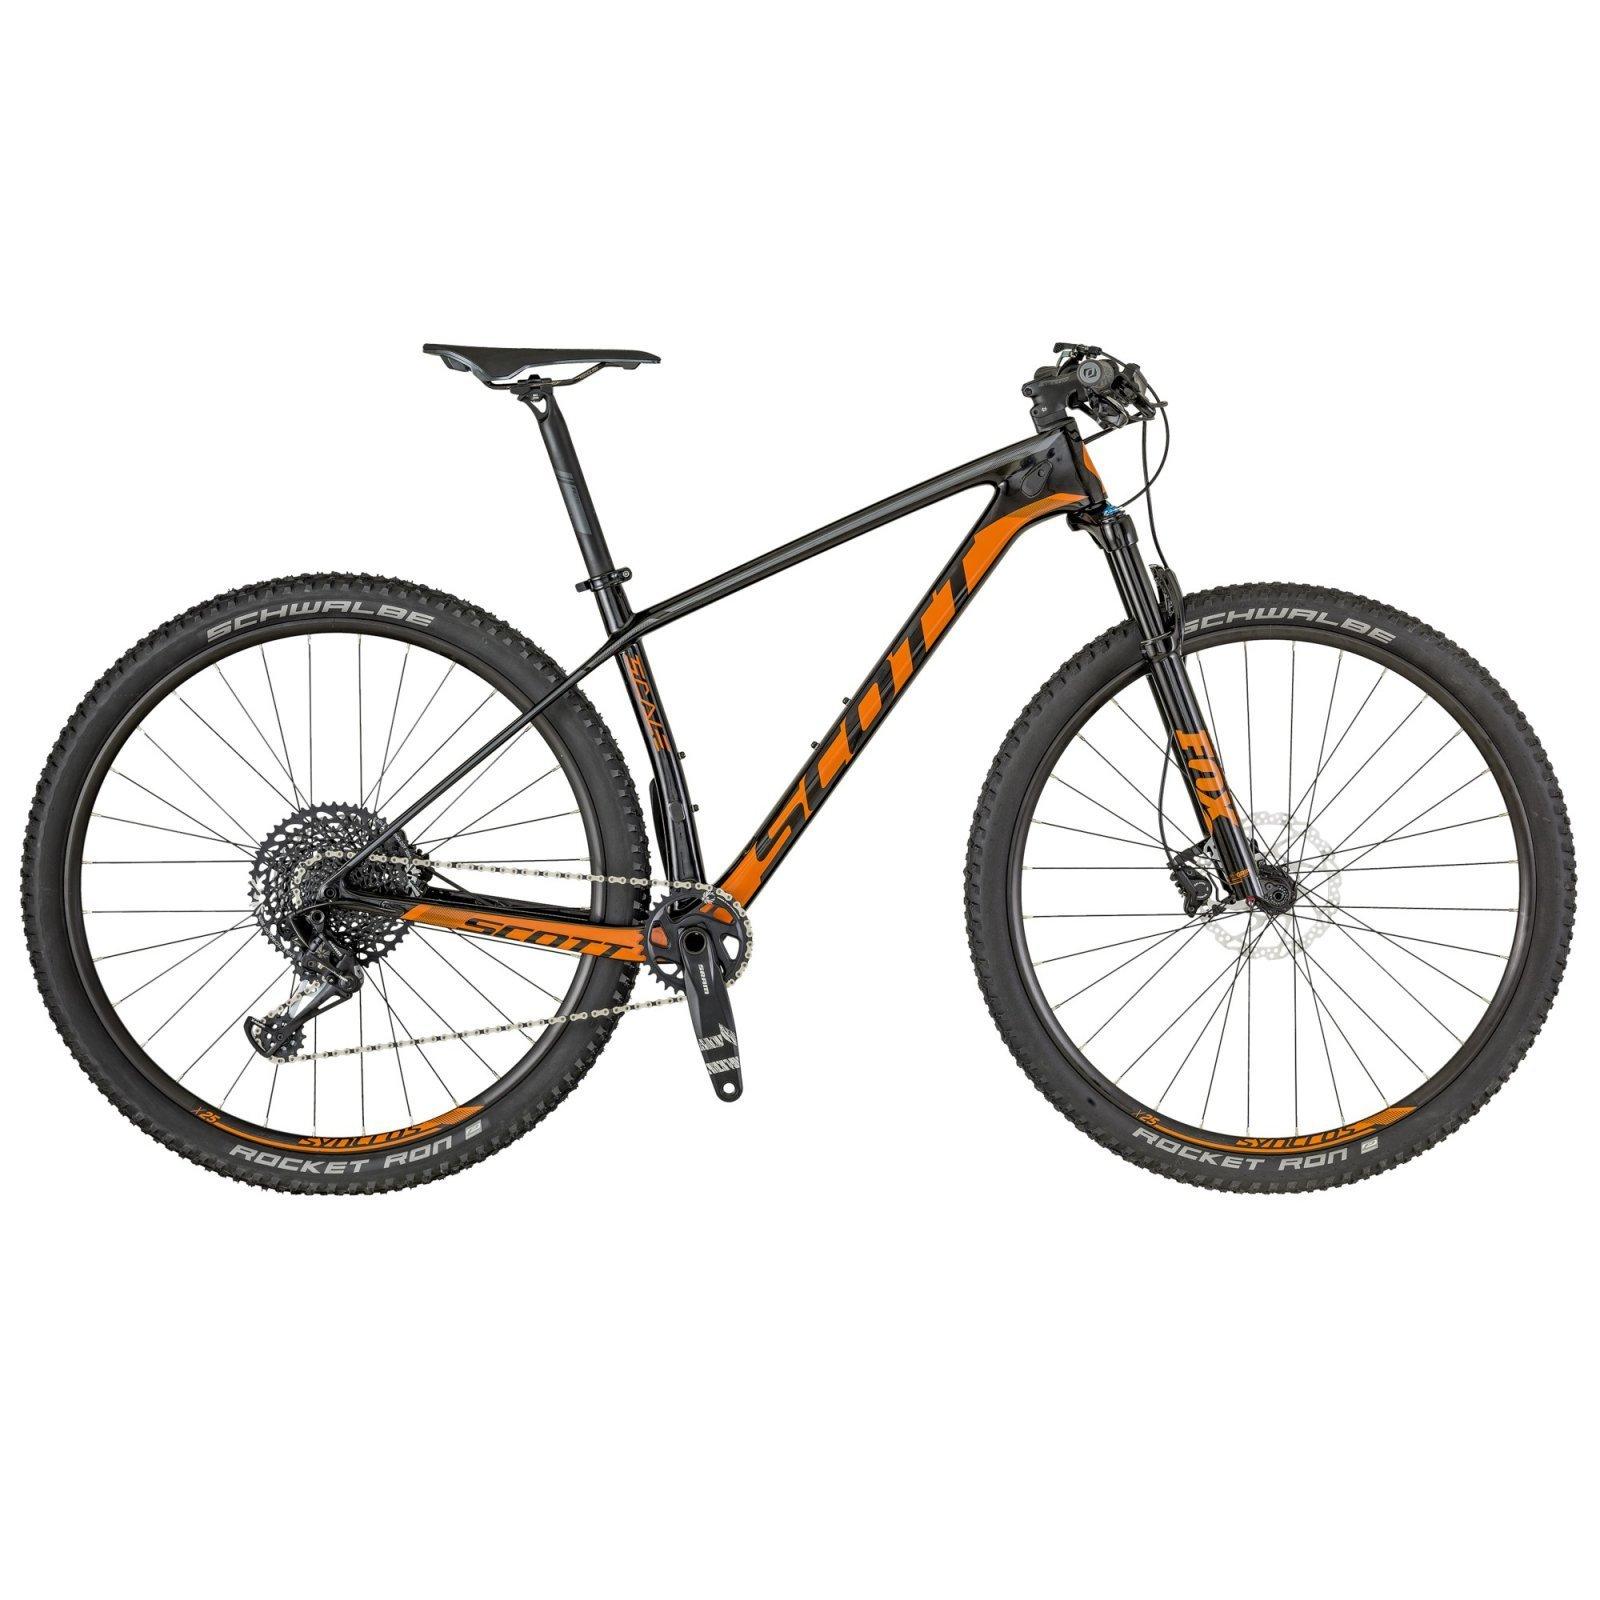 Bicicleta Scott Scale 925 2018